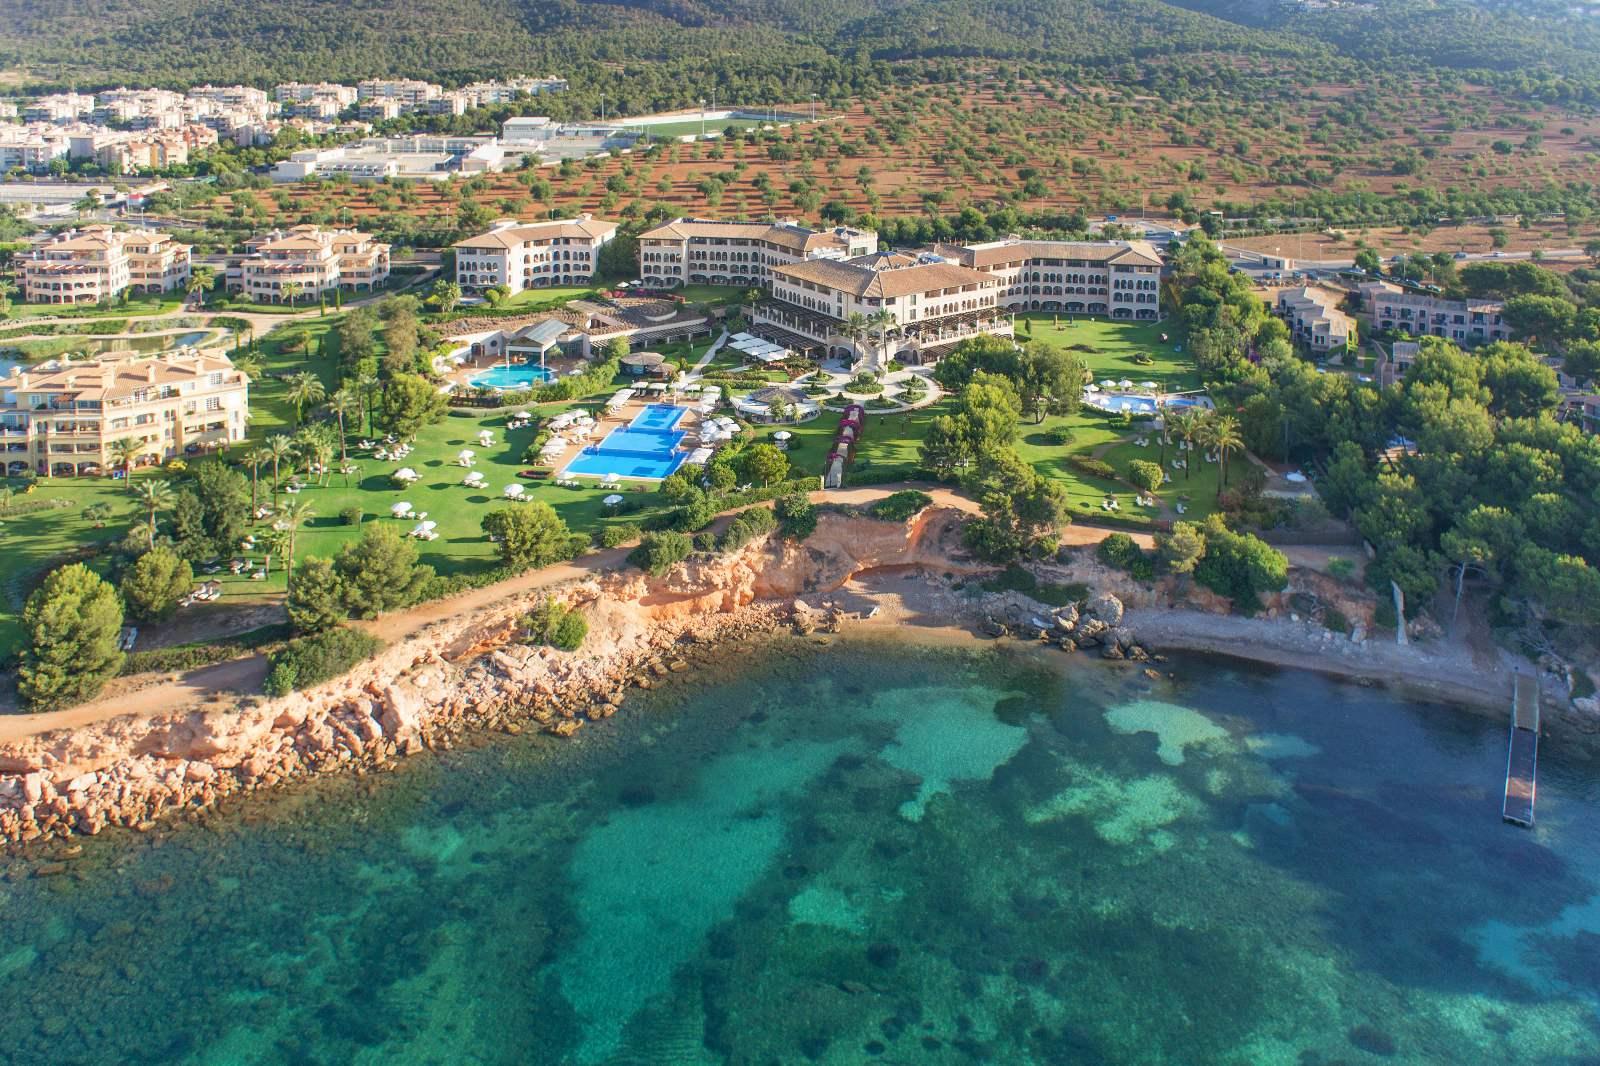 St. Regis Mardavall Resort